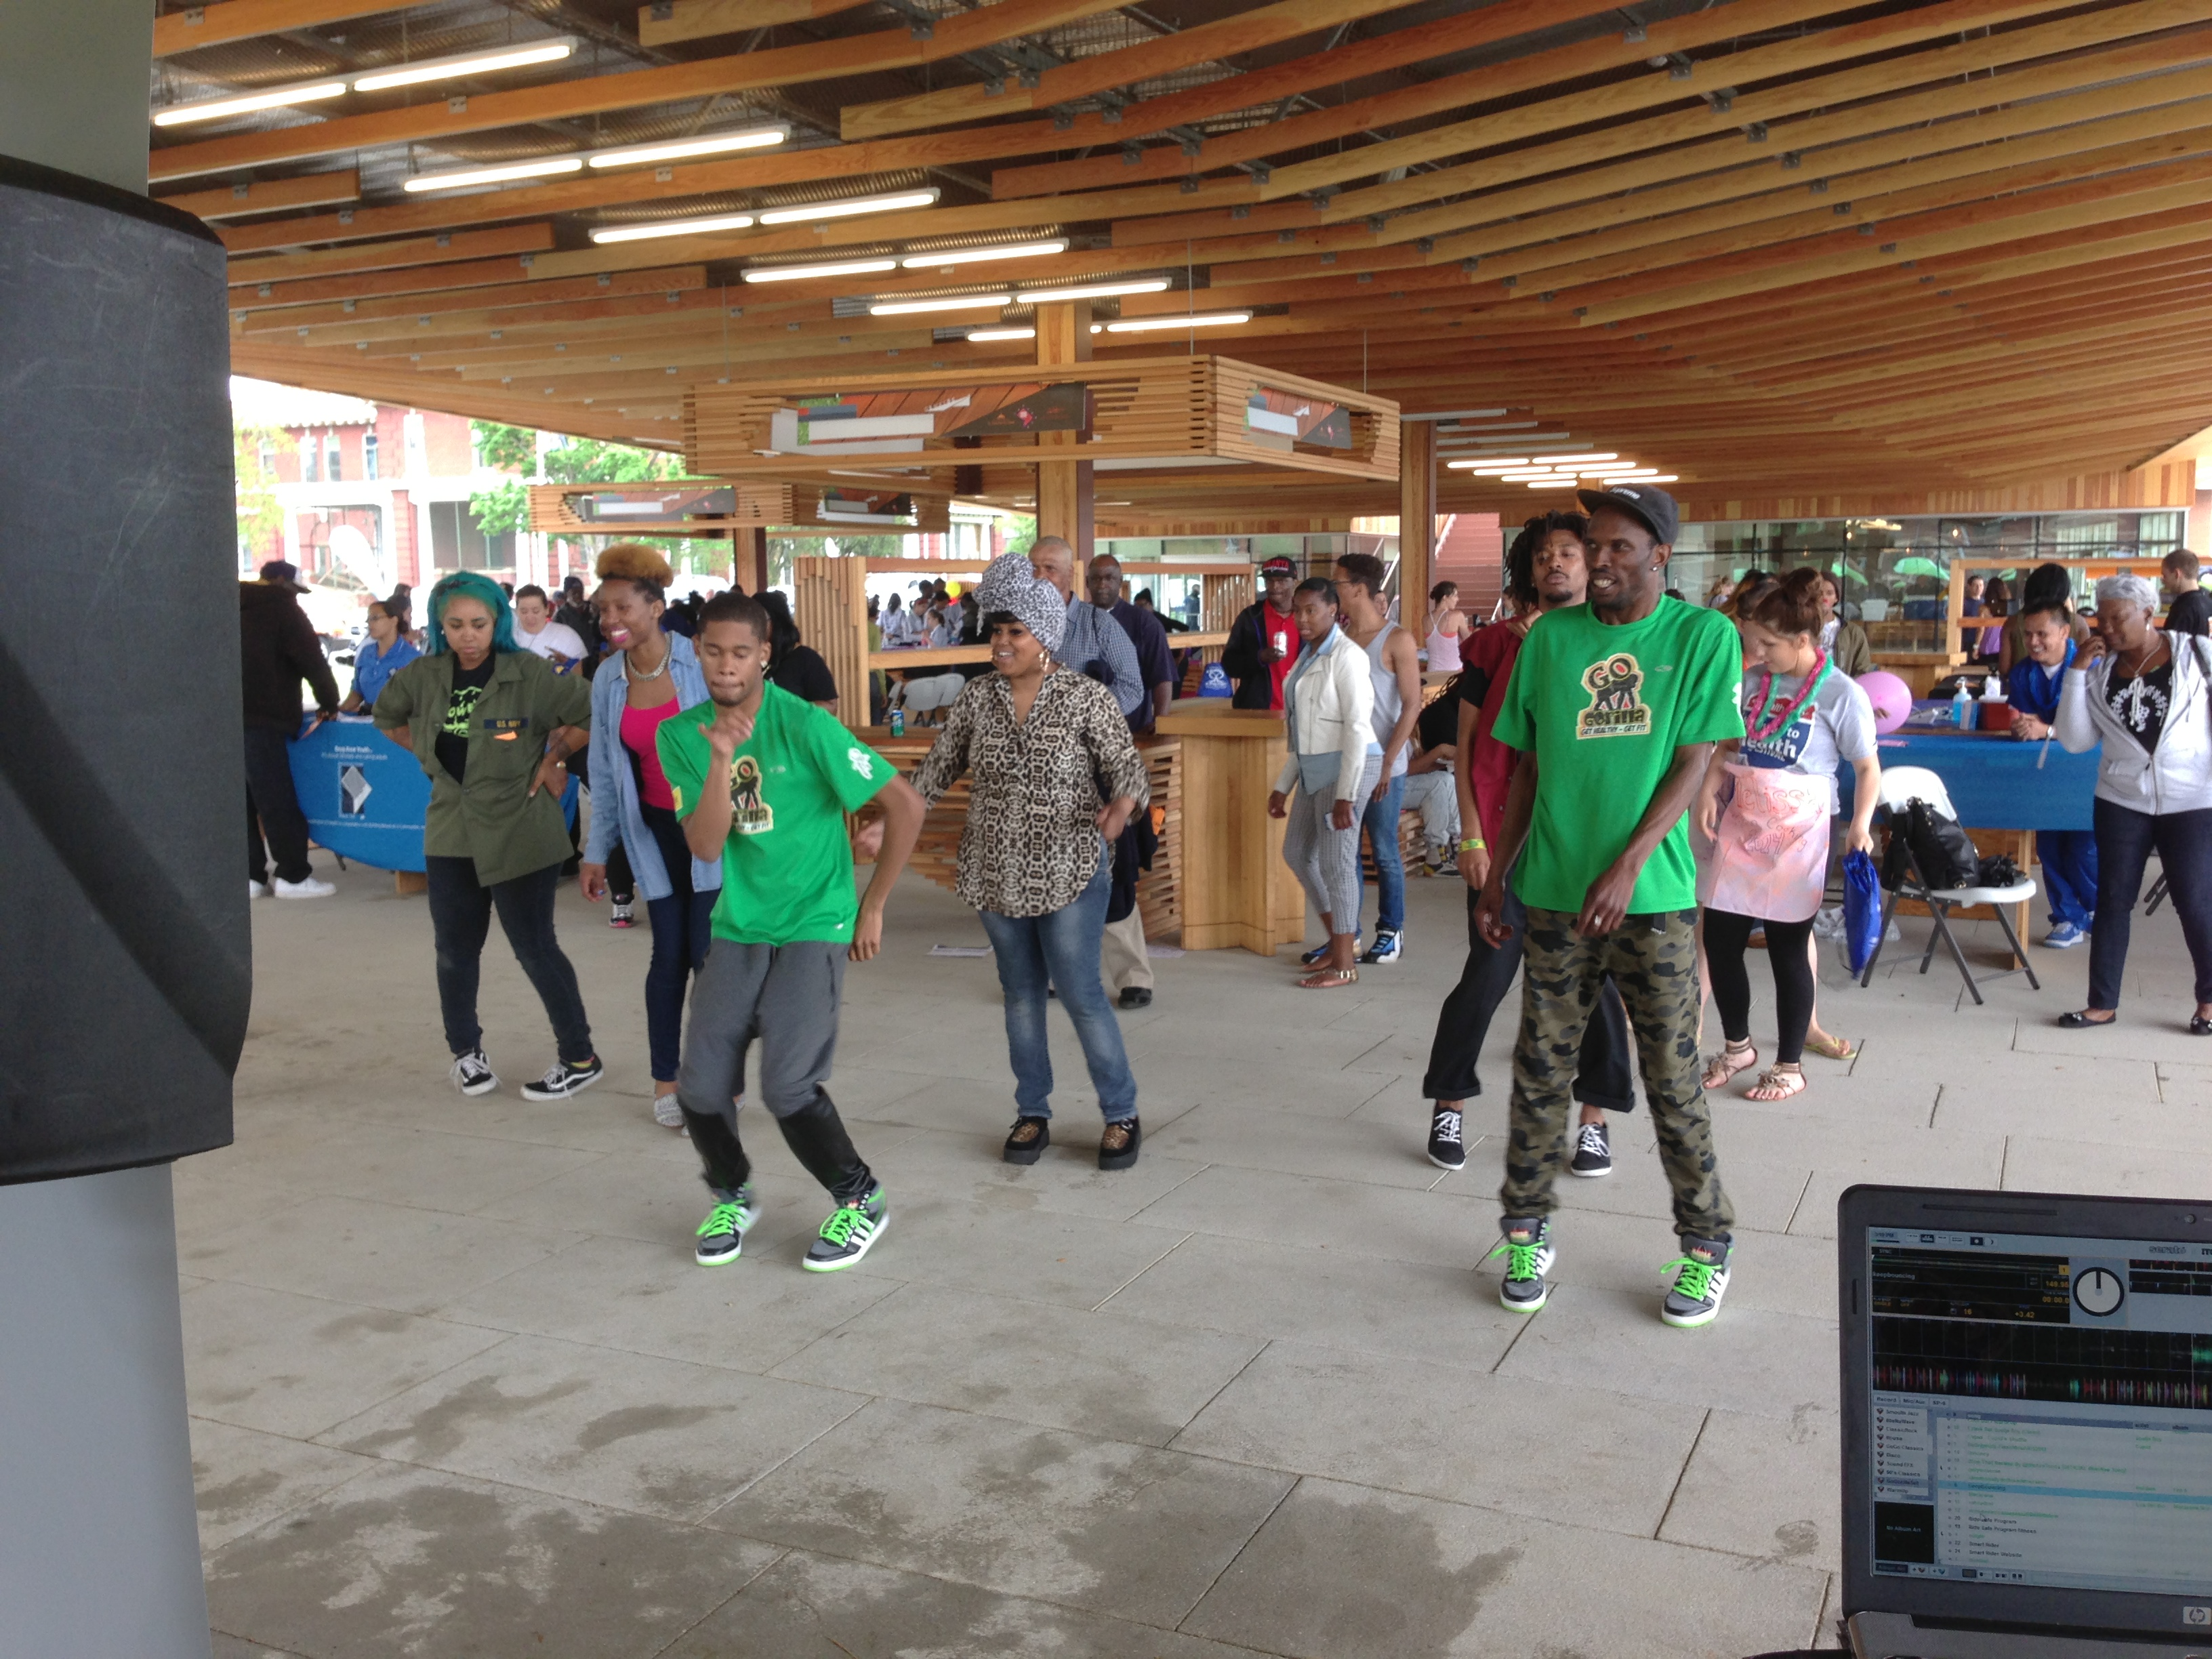 Street Wize Foundation's Go Gorilla Youth Fitness Program